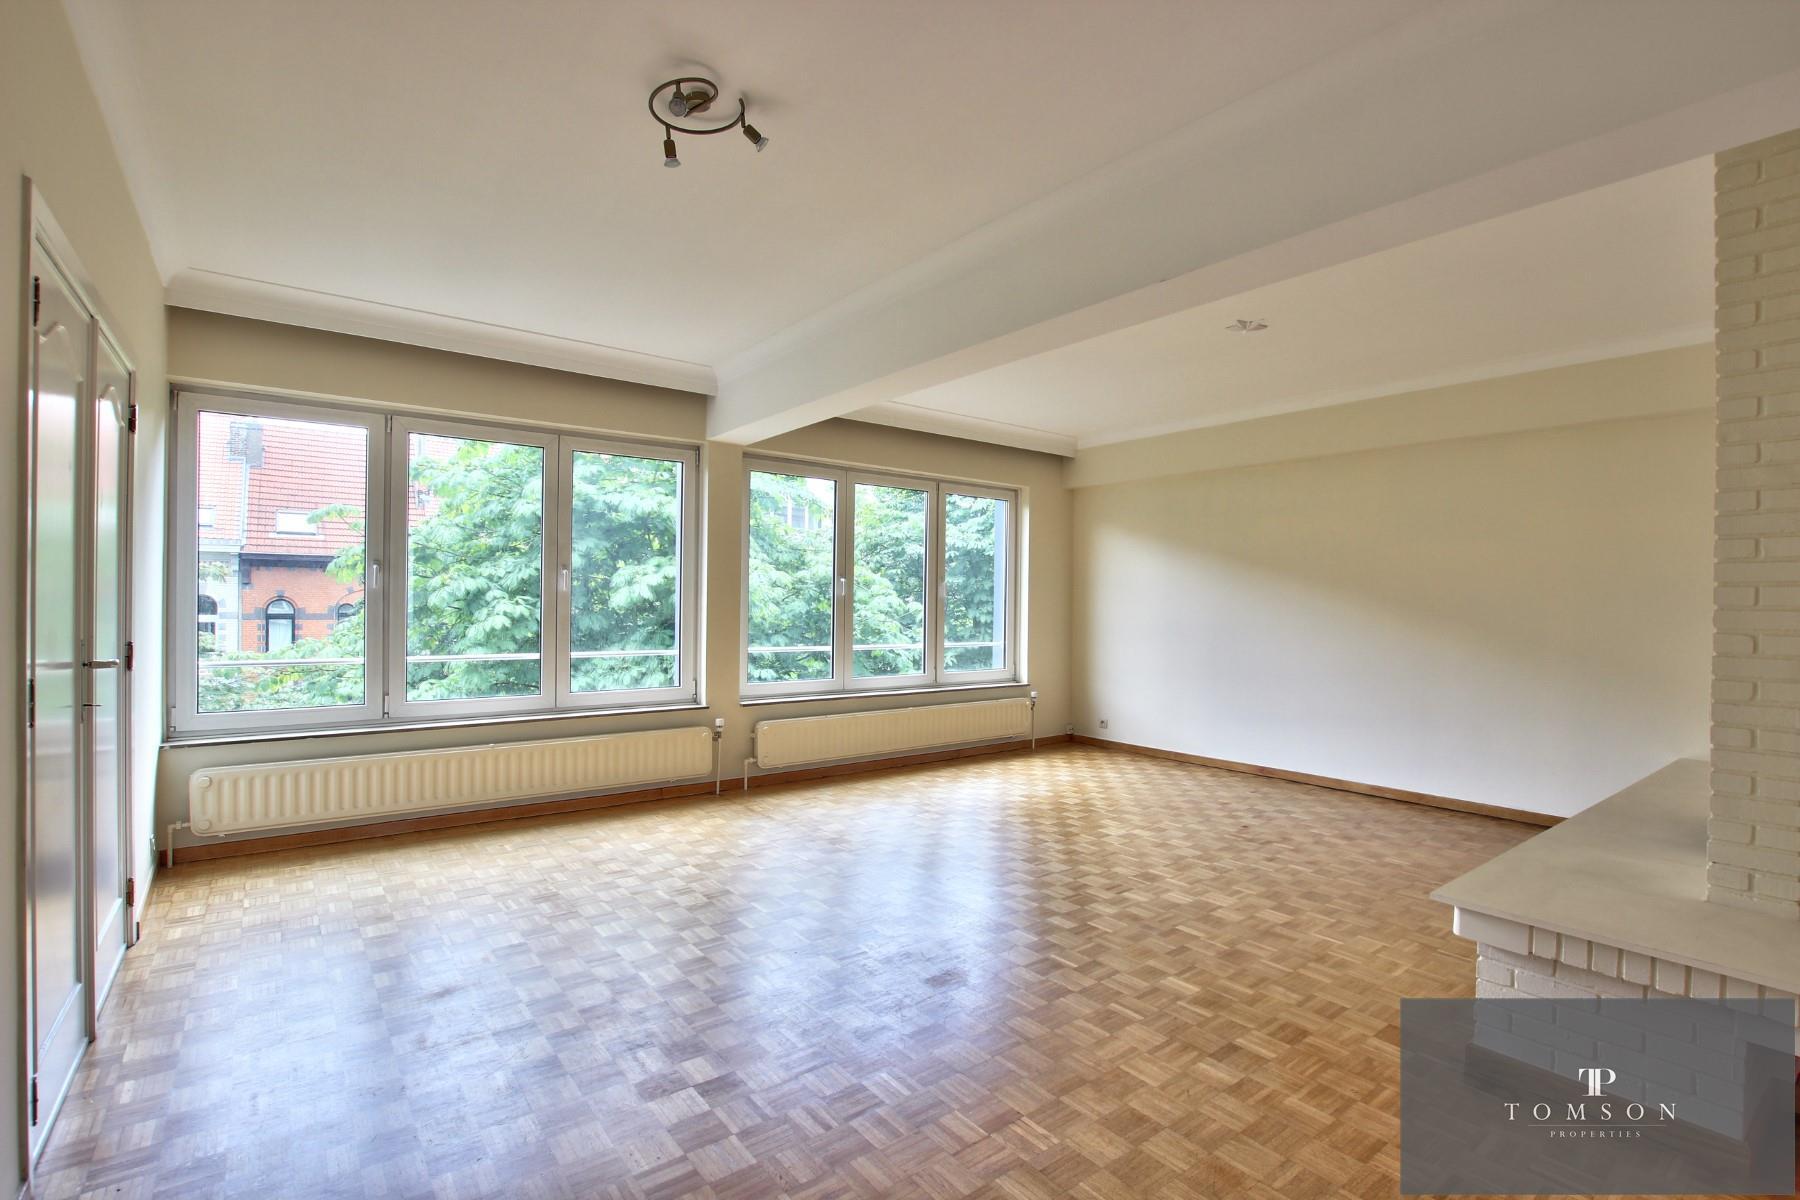 Flat - Etterbeek - #4496041-1